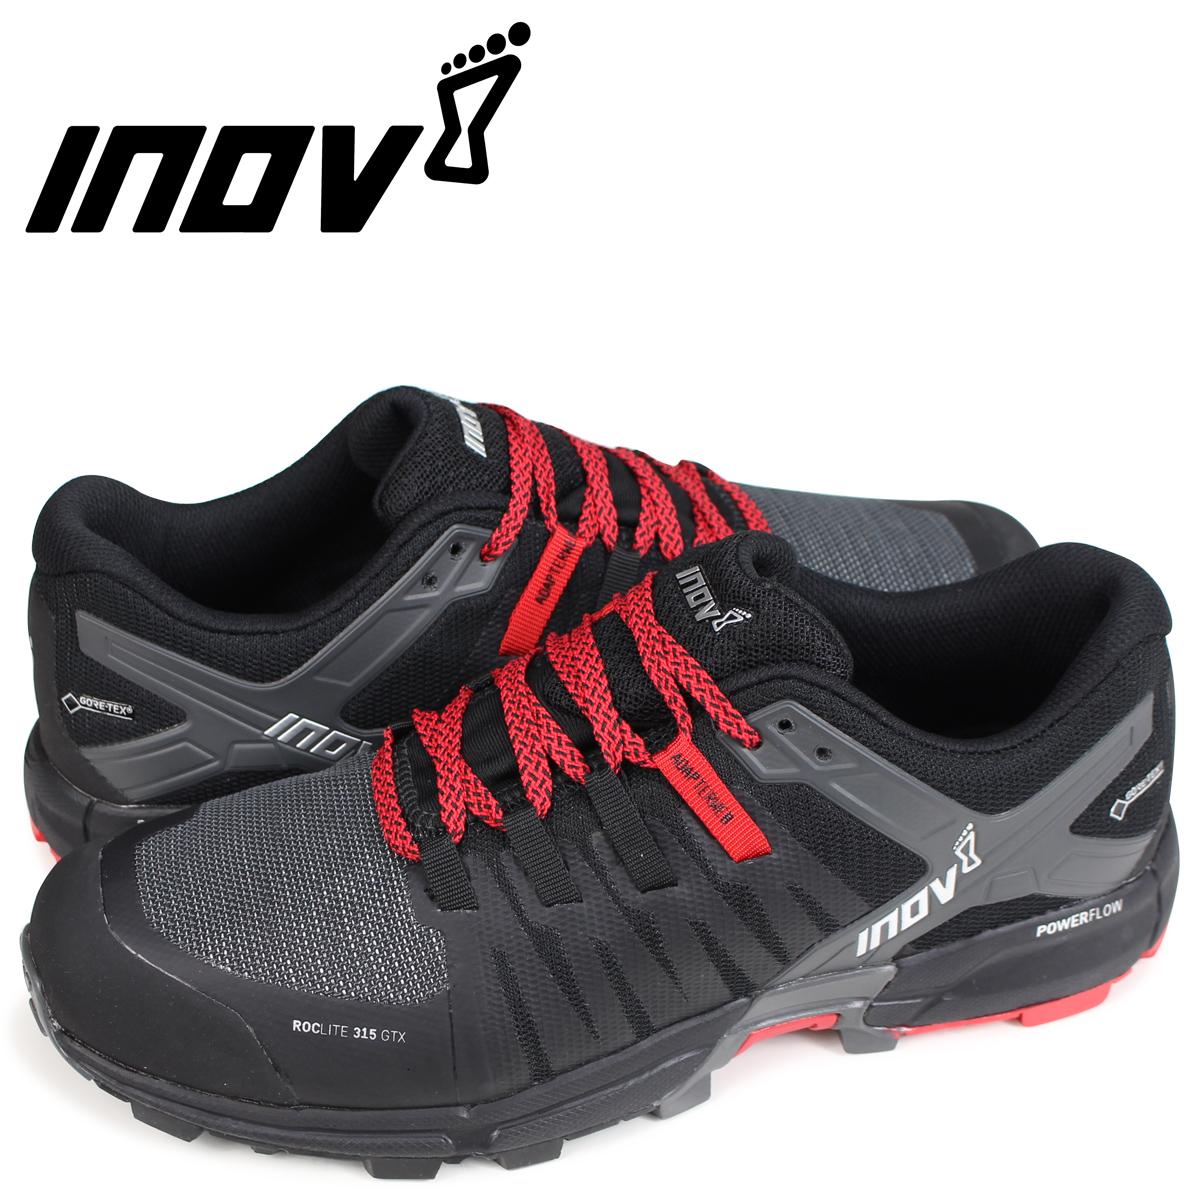 factory authentic 1da7e c58b1 イノヴェイト inov-8 lock light shoes trail running shoes ROCLITE 315 GTX MS  NO2LIG07 men black